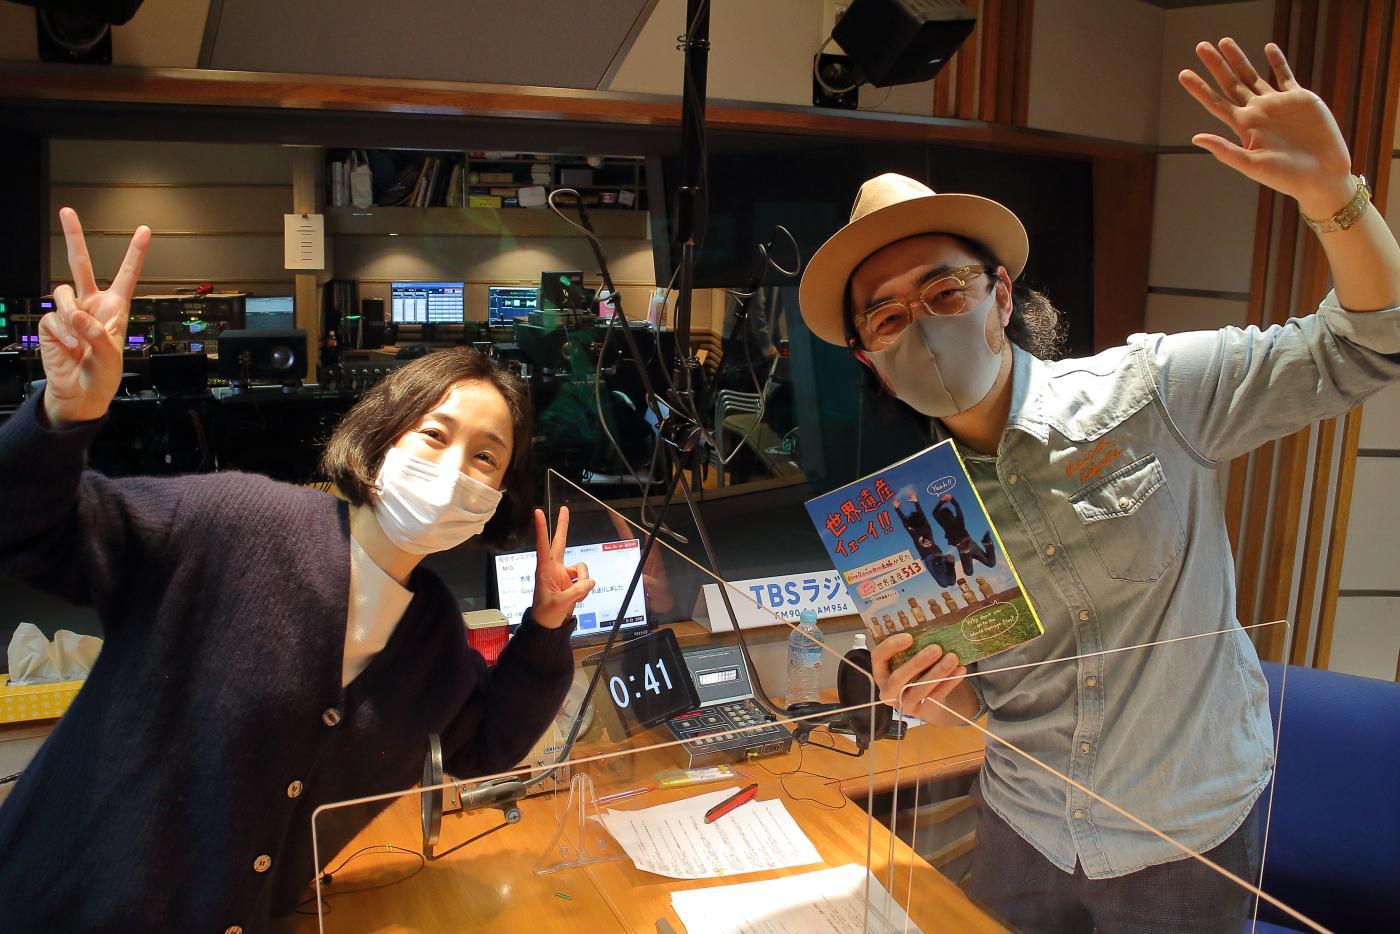 TBSラジオ「金曜ボイスログ」にて世界遺産をレビュー!